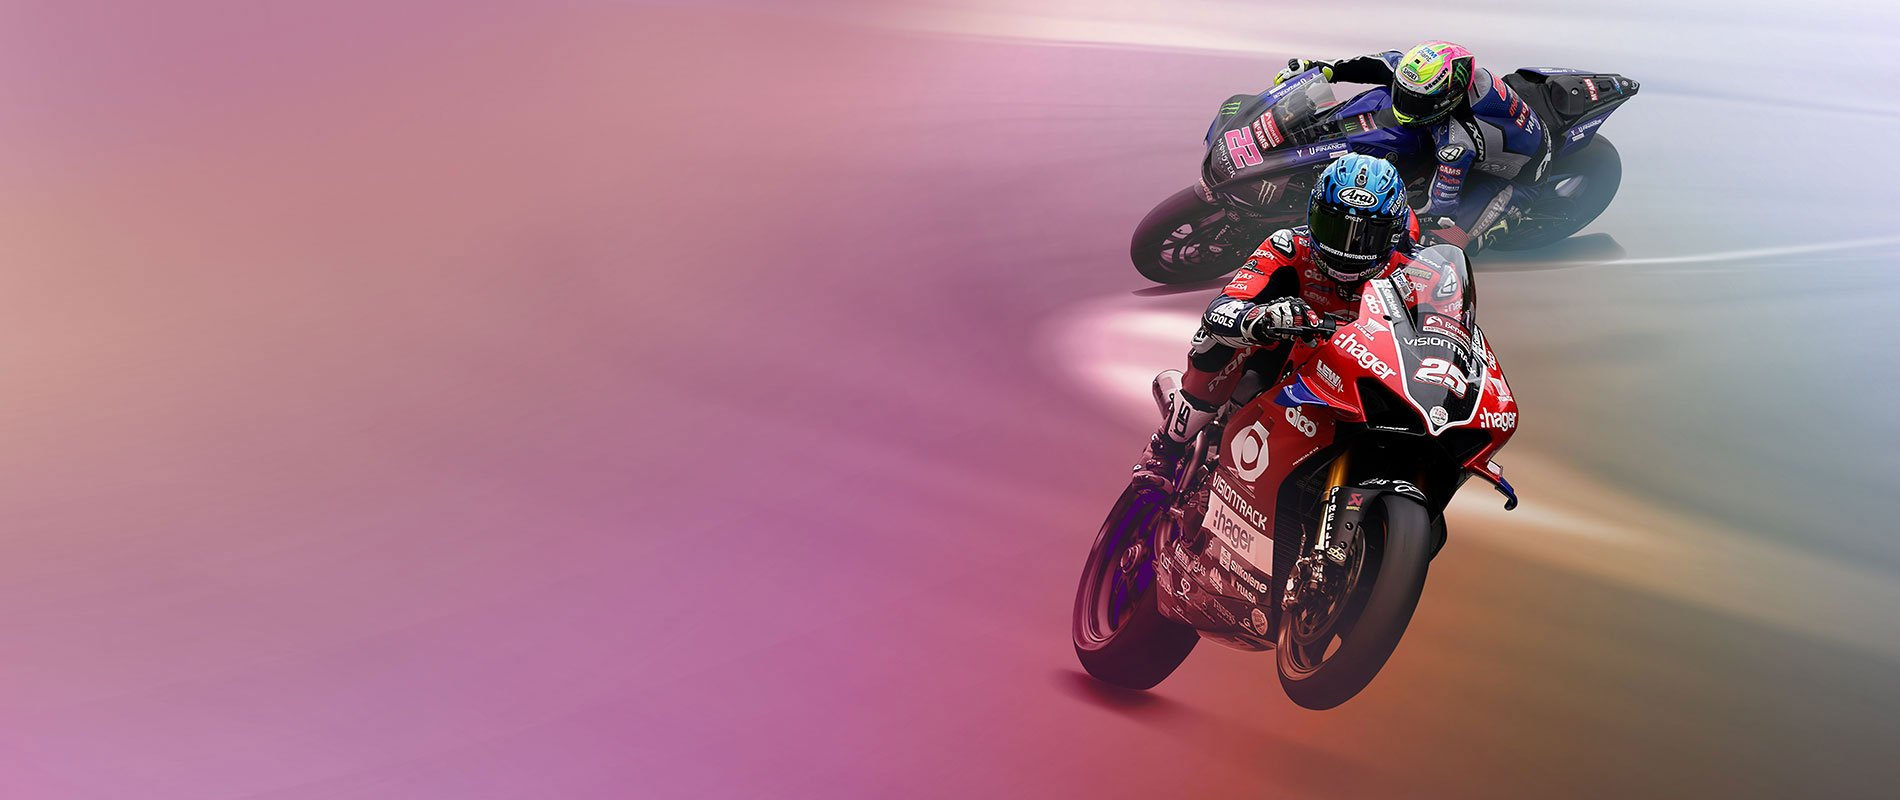 2022 Bennetts British Superbike Championship